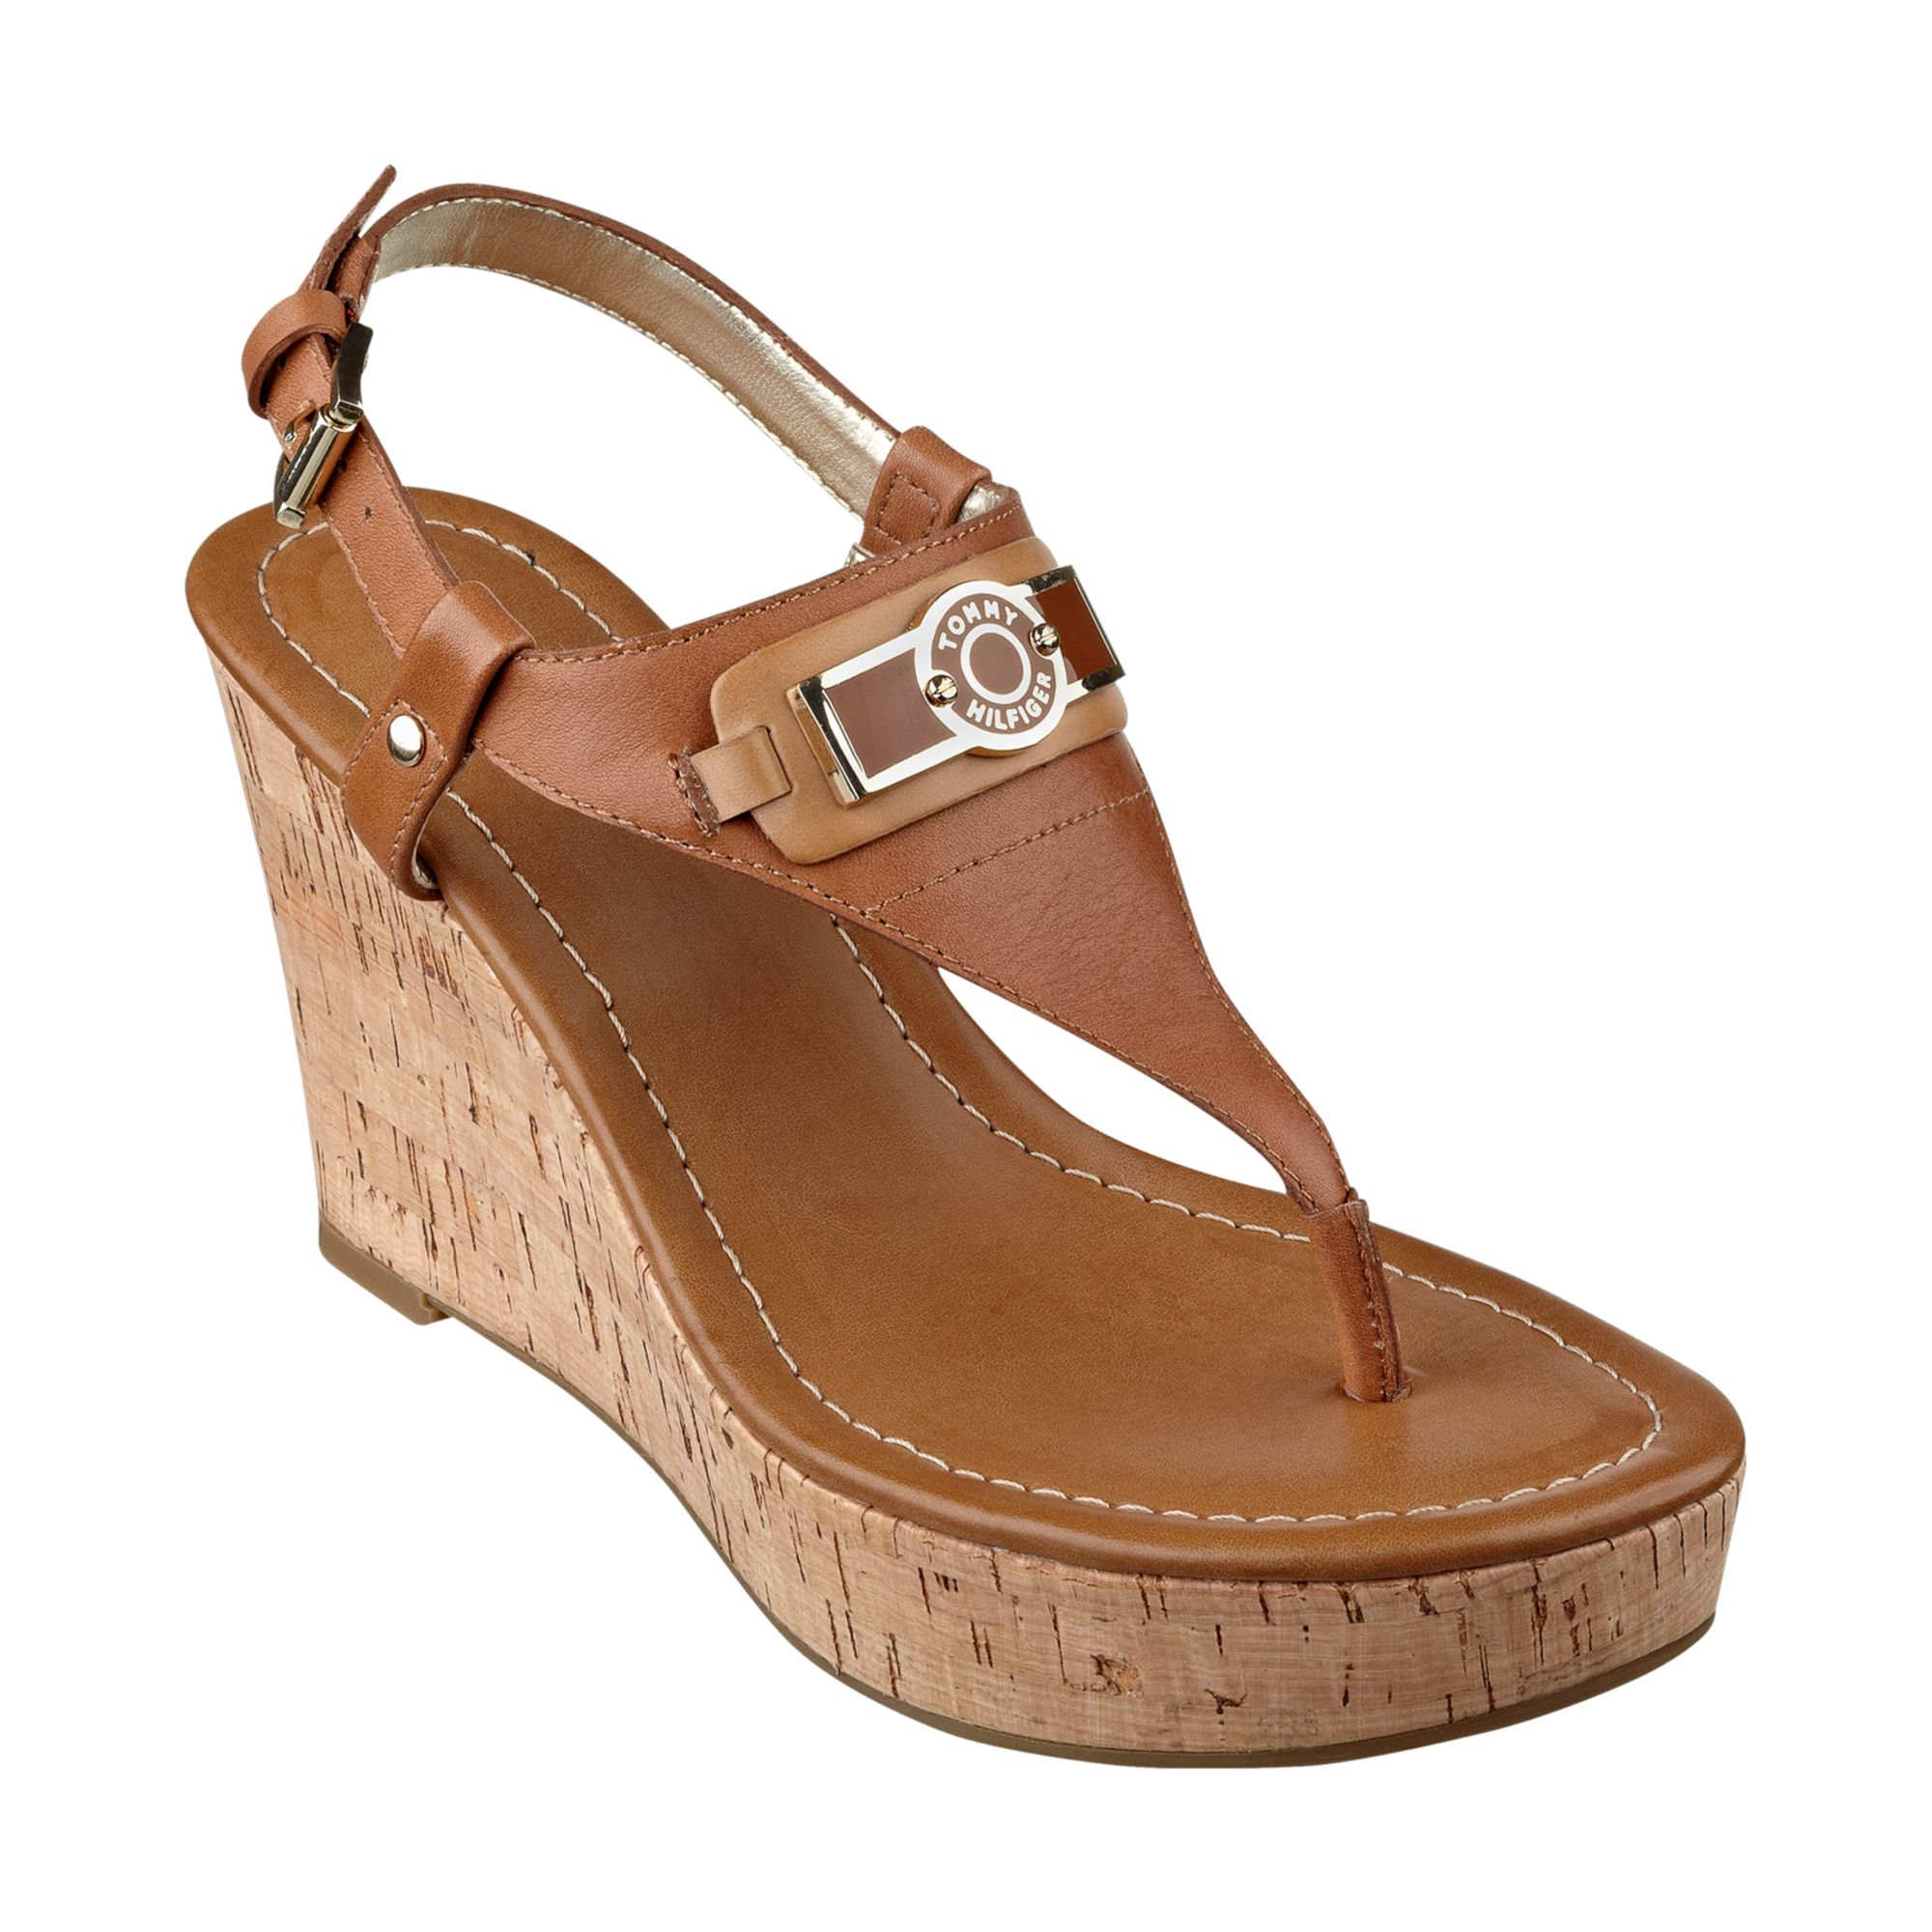 tommy hilfiger womens monor platform wedge thong sandals in brown luggage lyst. Black Bedroom Furniture Sets. Home Design Ideas